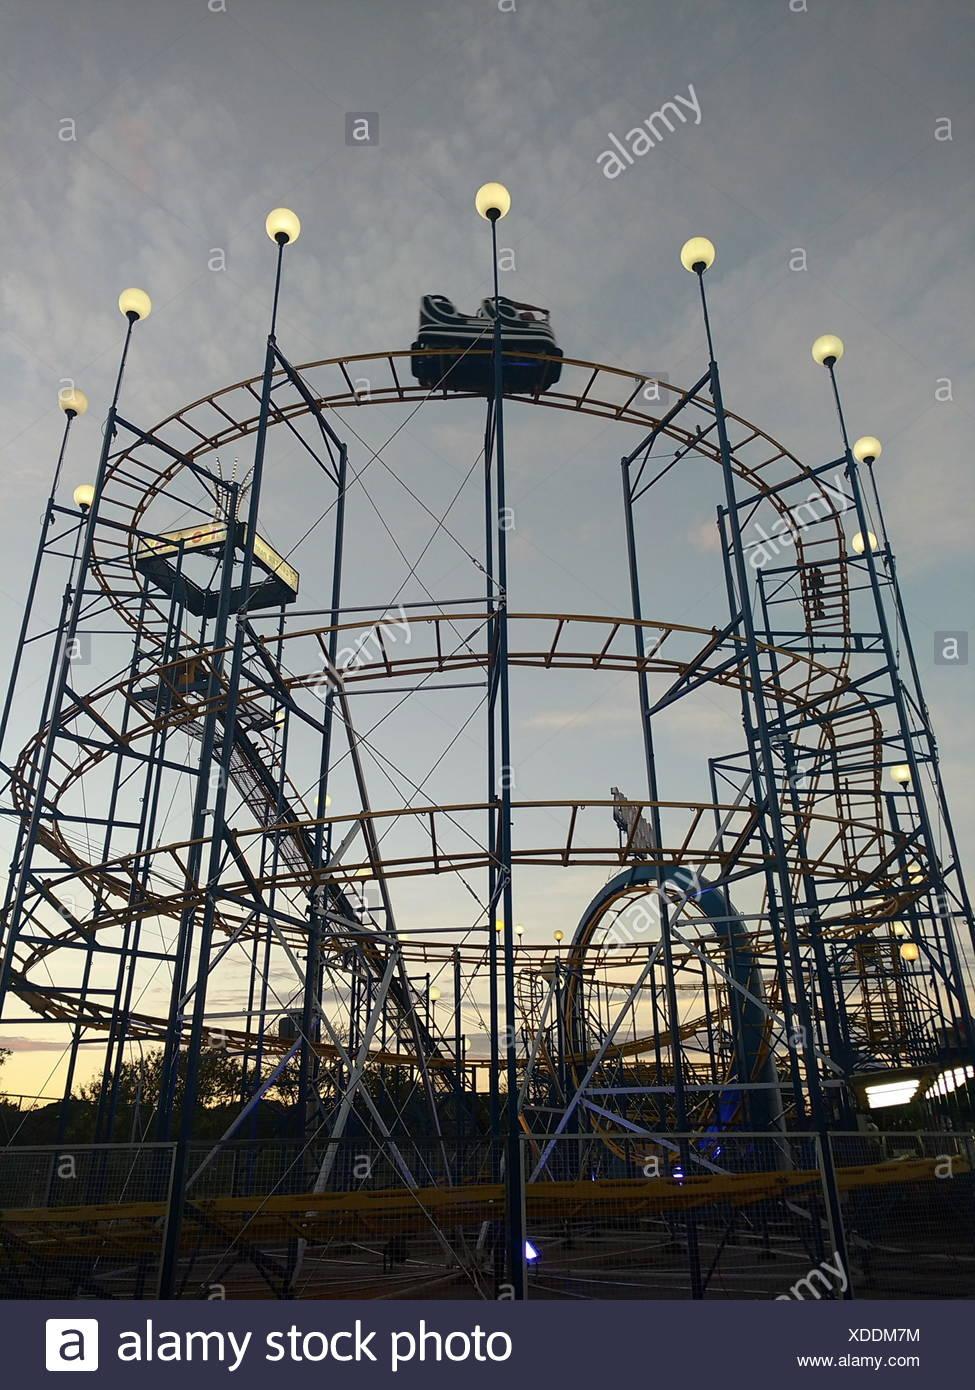 Amusement parks roller coaster Stock Photo